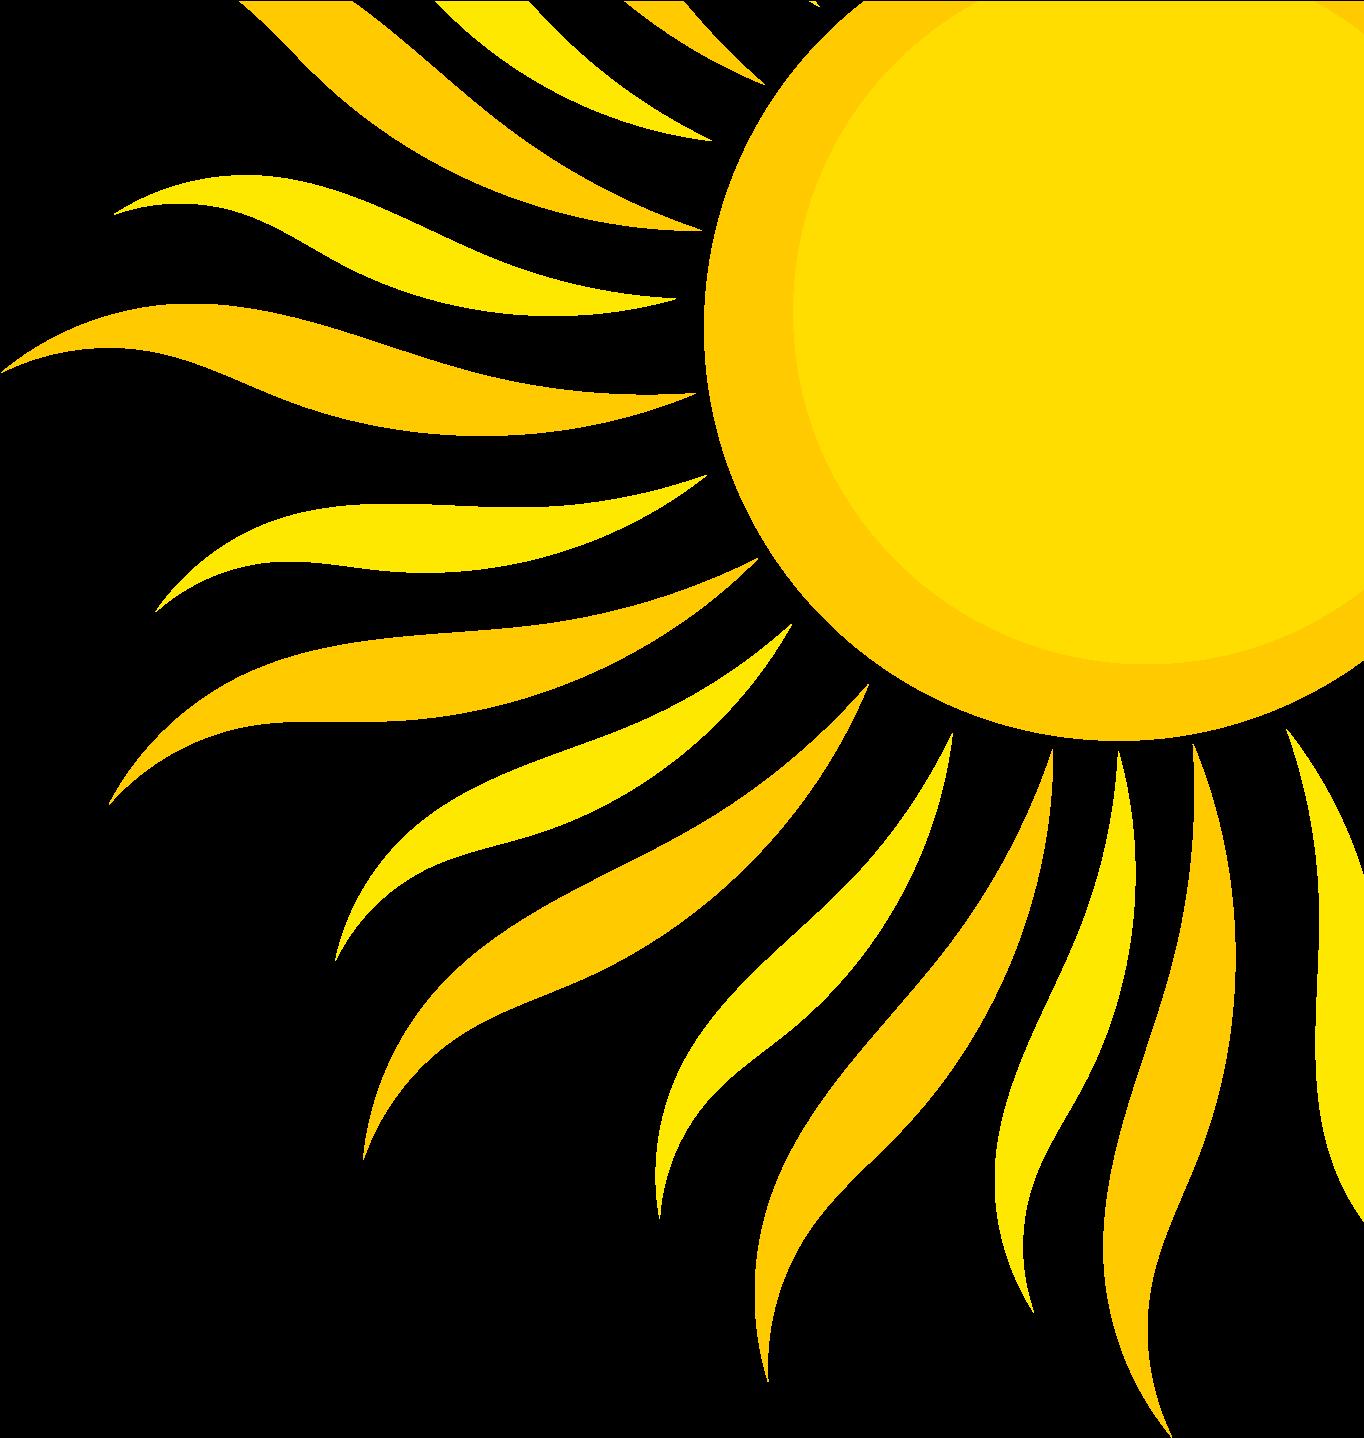 Quarter summer png transparent. Clipart sunshine sun shine